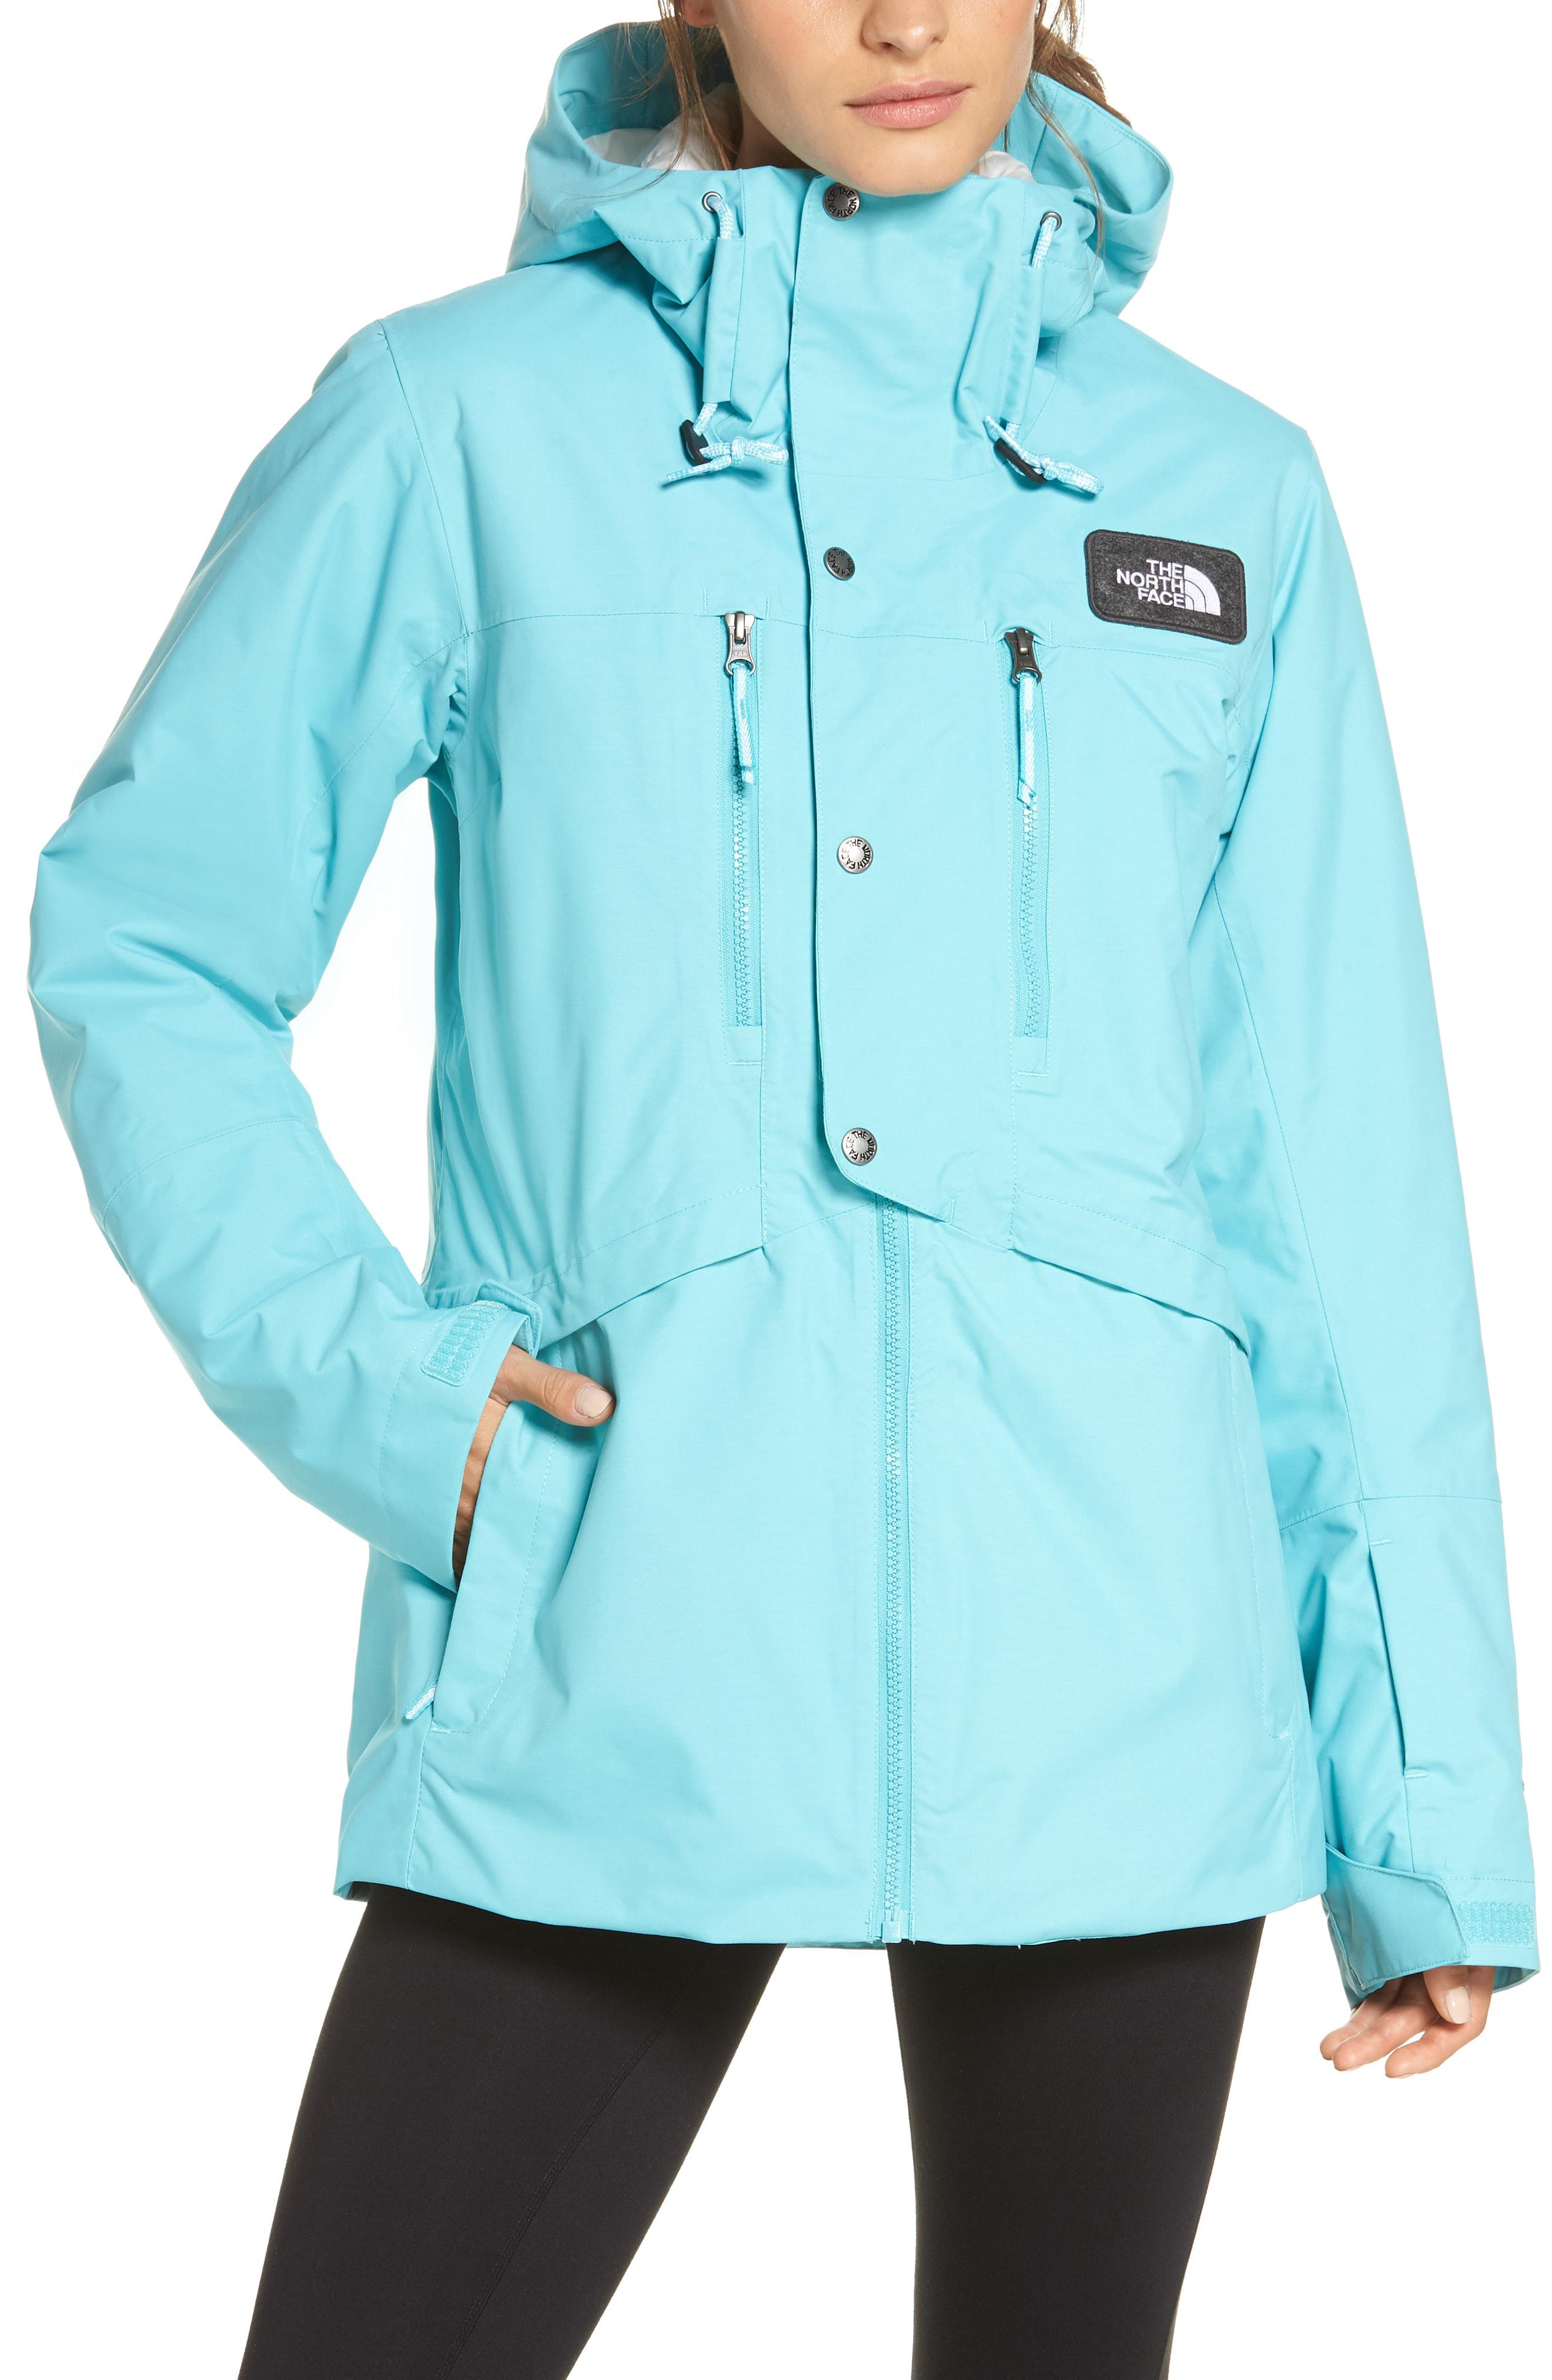 ce3c38f927e The North Face Superlu Weatherproof Hooded Ski Jacket in Blue - Lyst